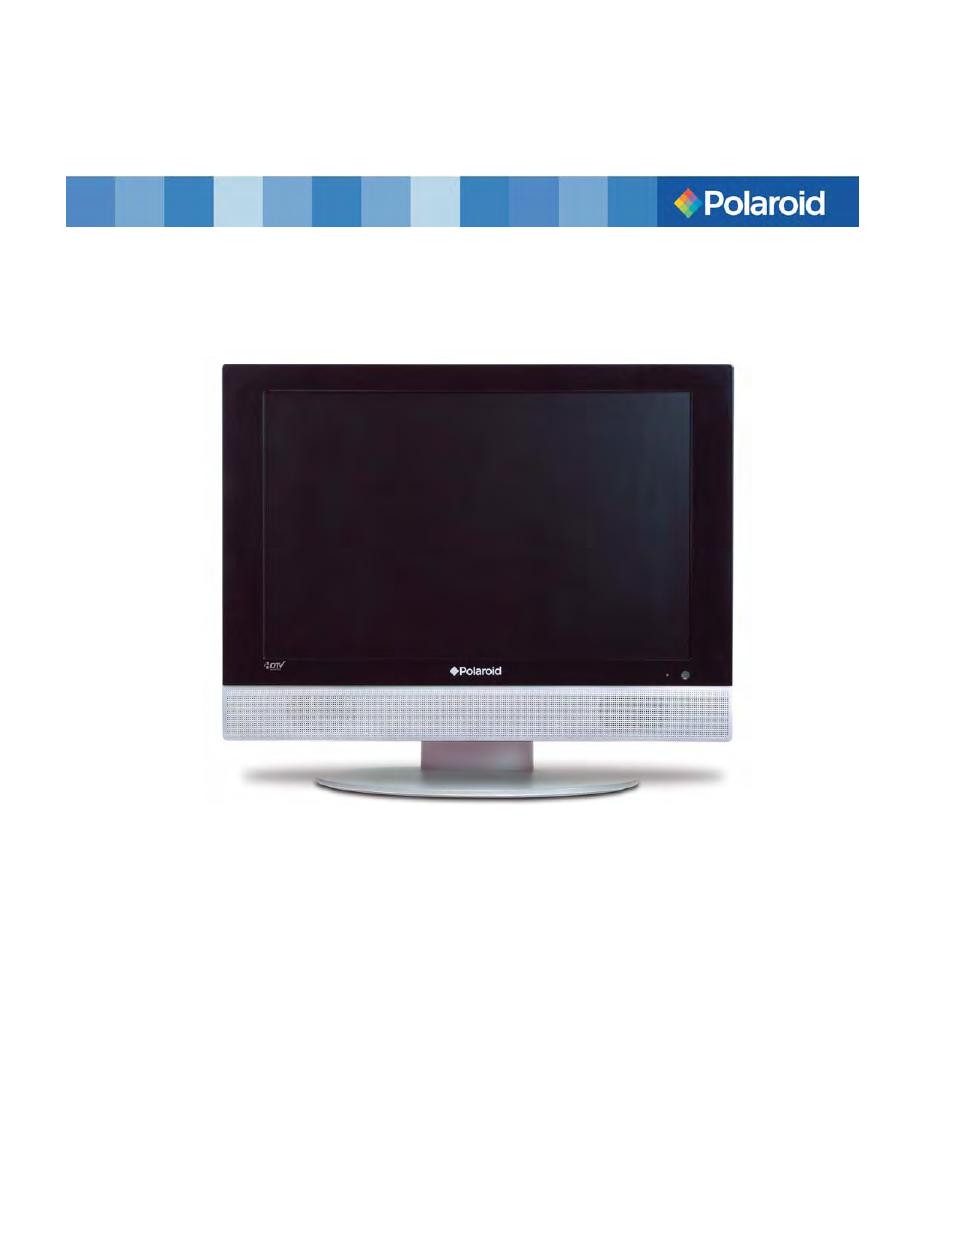 polaroid fxm 1911c user manual 43 pages rh manualsdir com polaroid dvd tv combo troubleshooting Polaroid DVD Repair